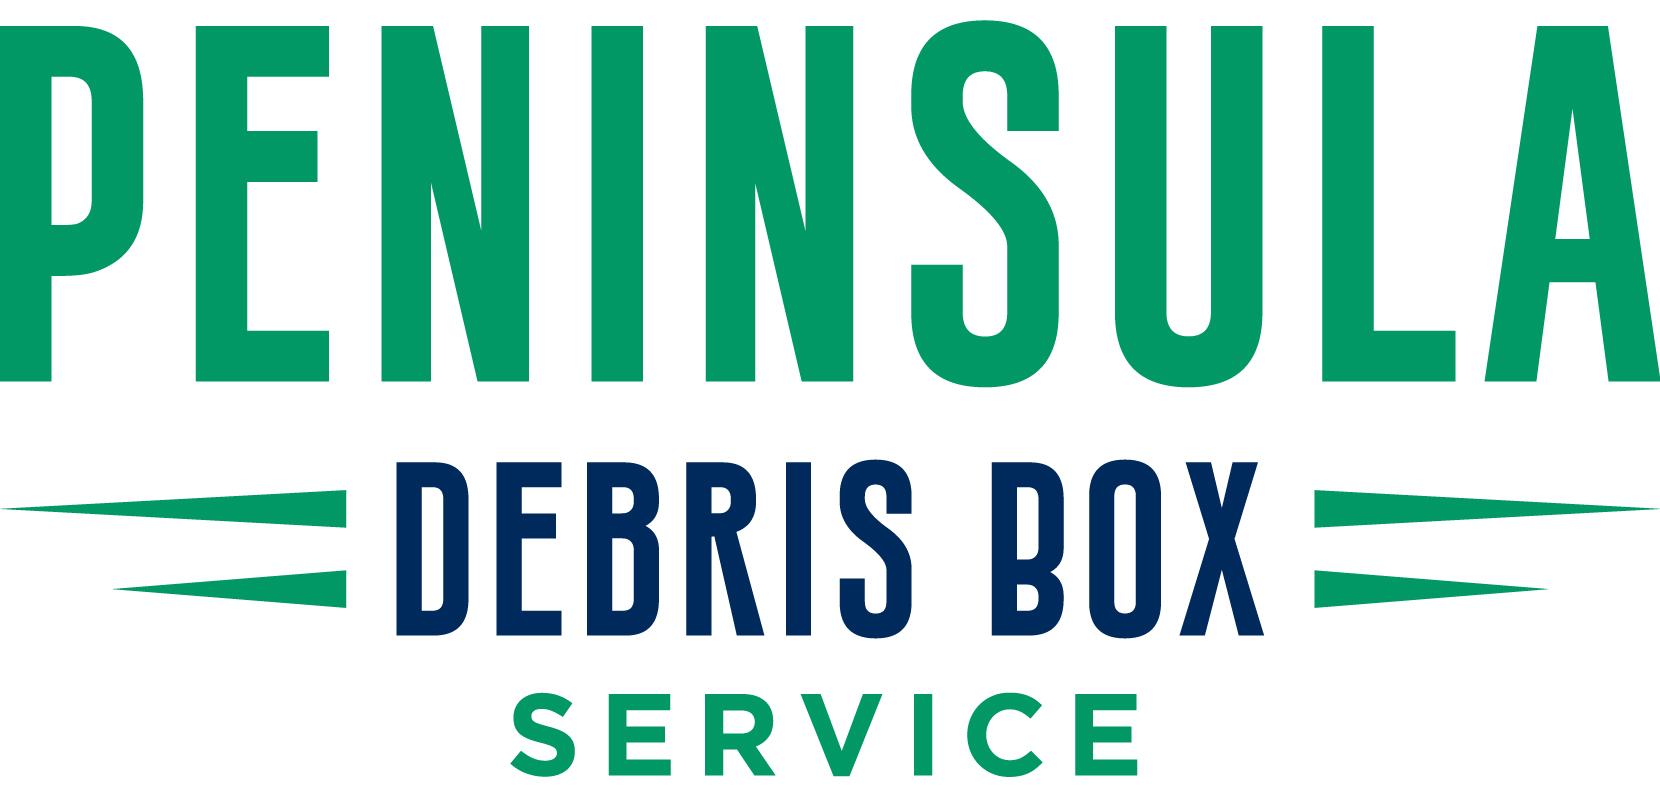 Welcome to Peninsula Debris Box Service